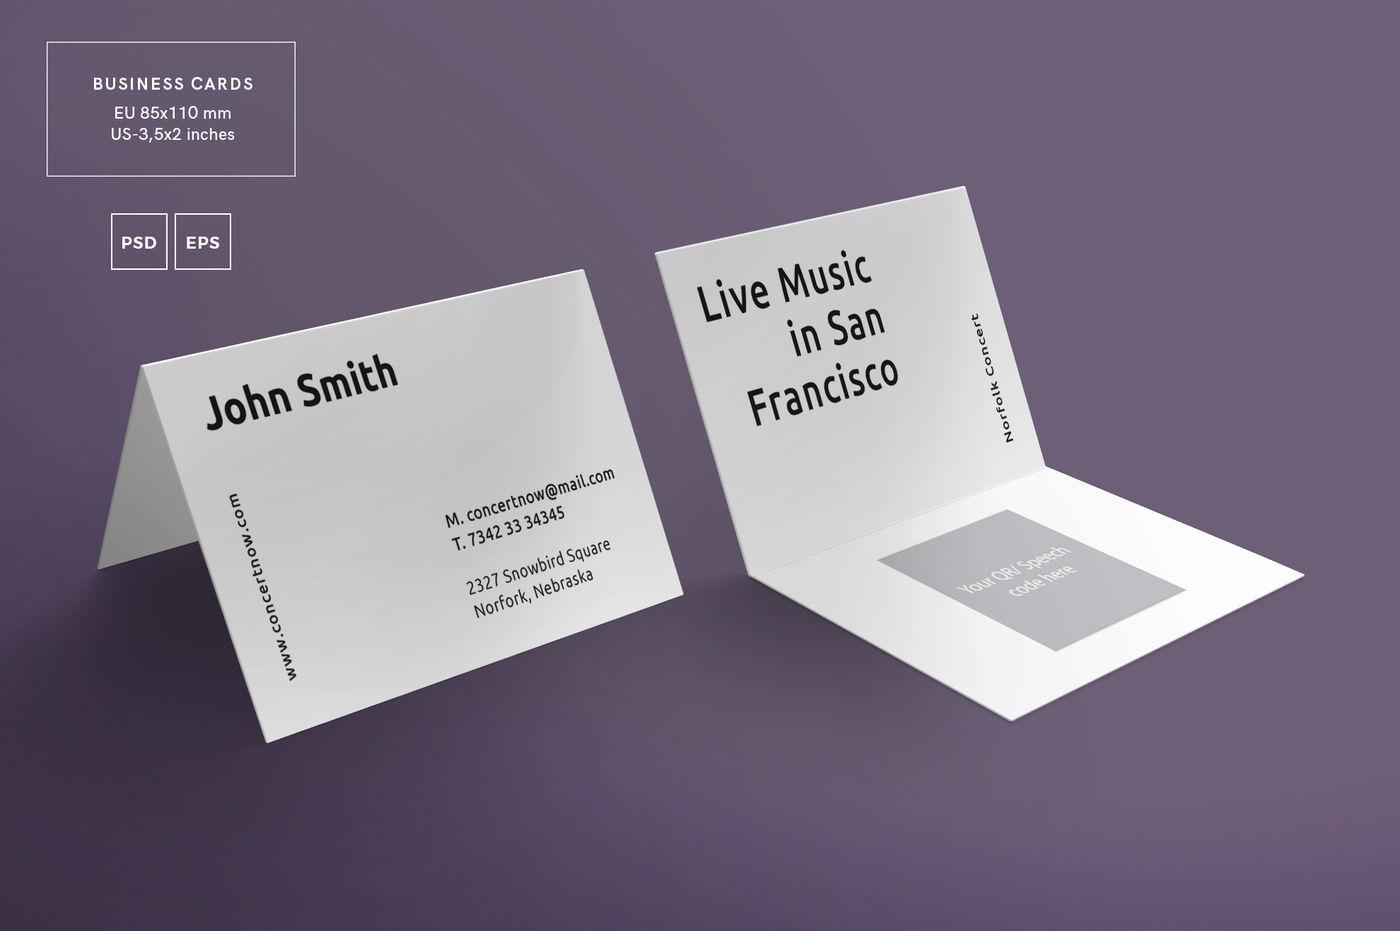 Download Concert Ticket Mockup Psd Free Free Mockups Psd Template Design Assets PSD Mockup Templates